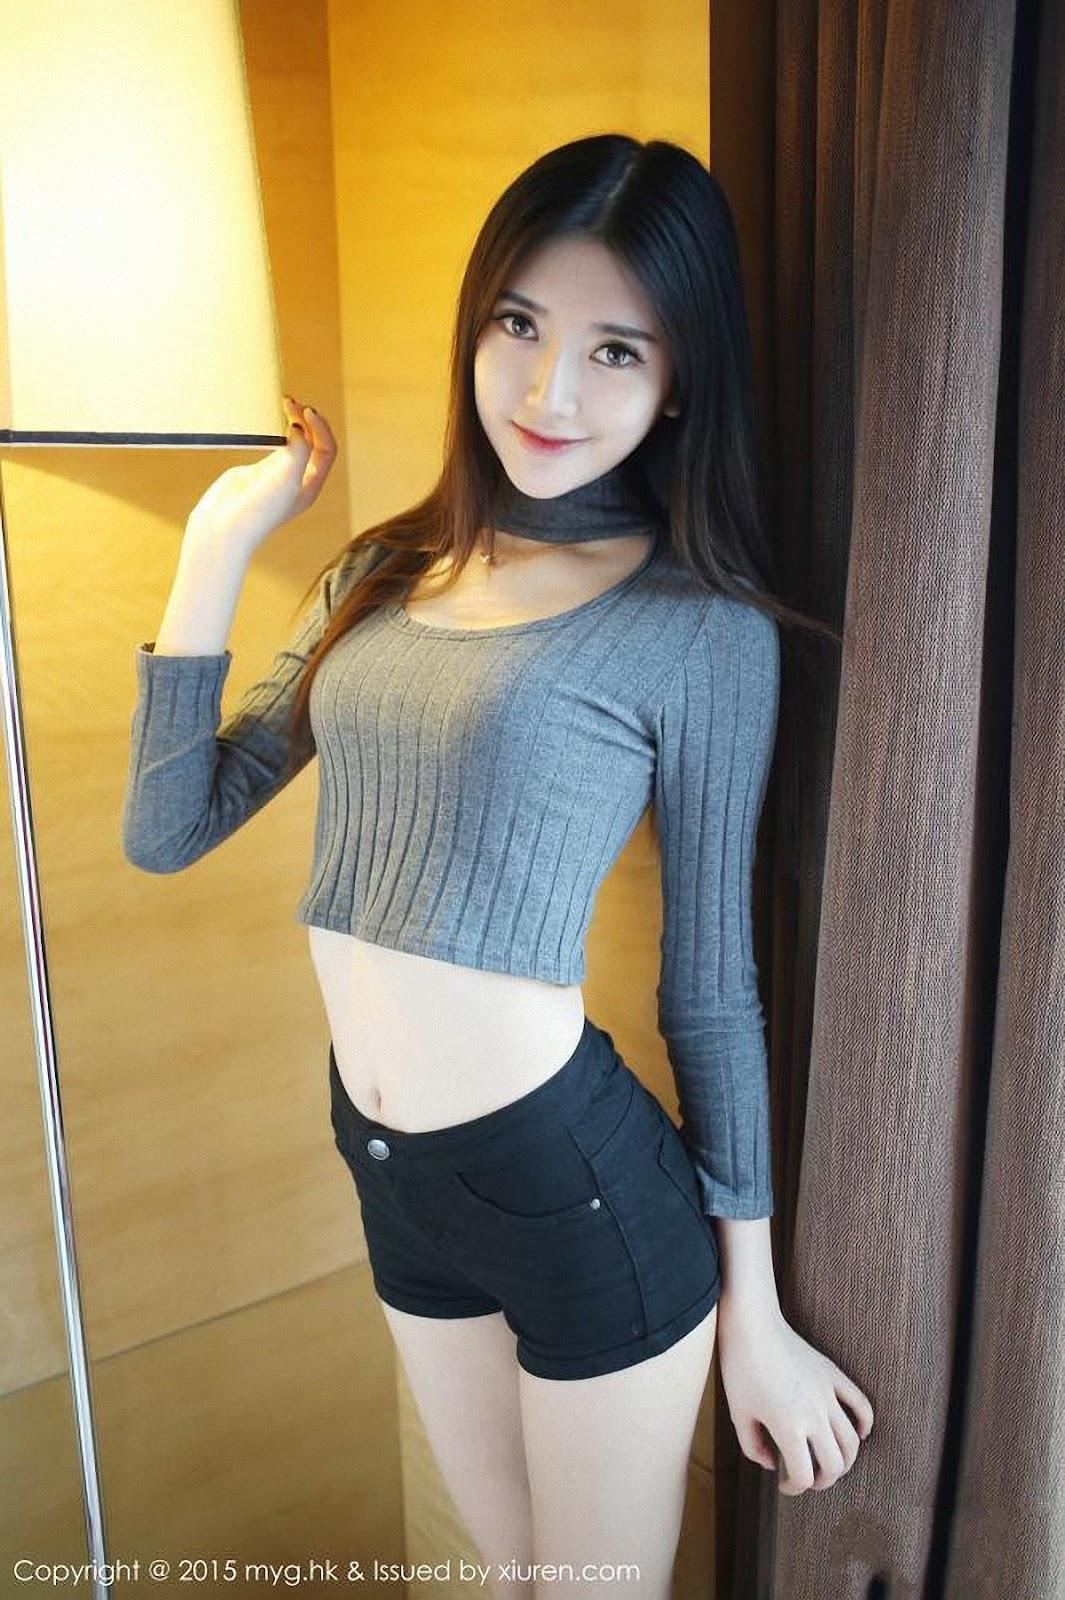 23 - Sexy Girl Model MYGIRL VOL.119